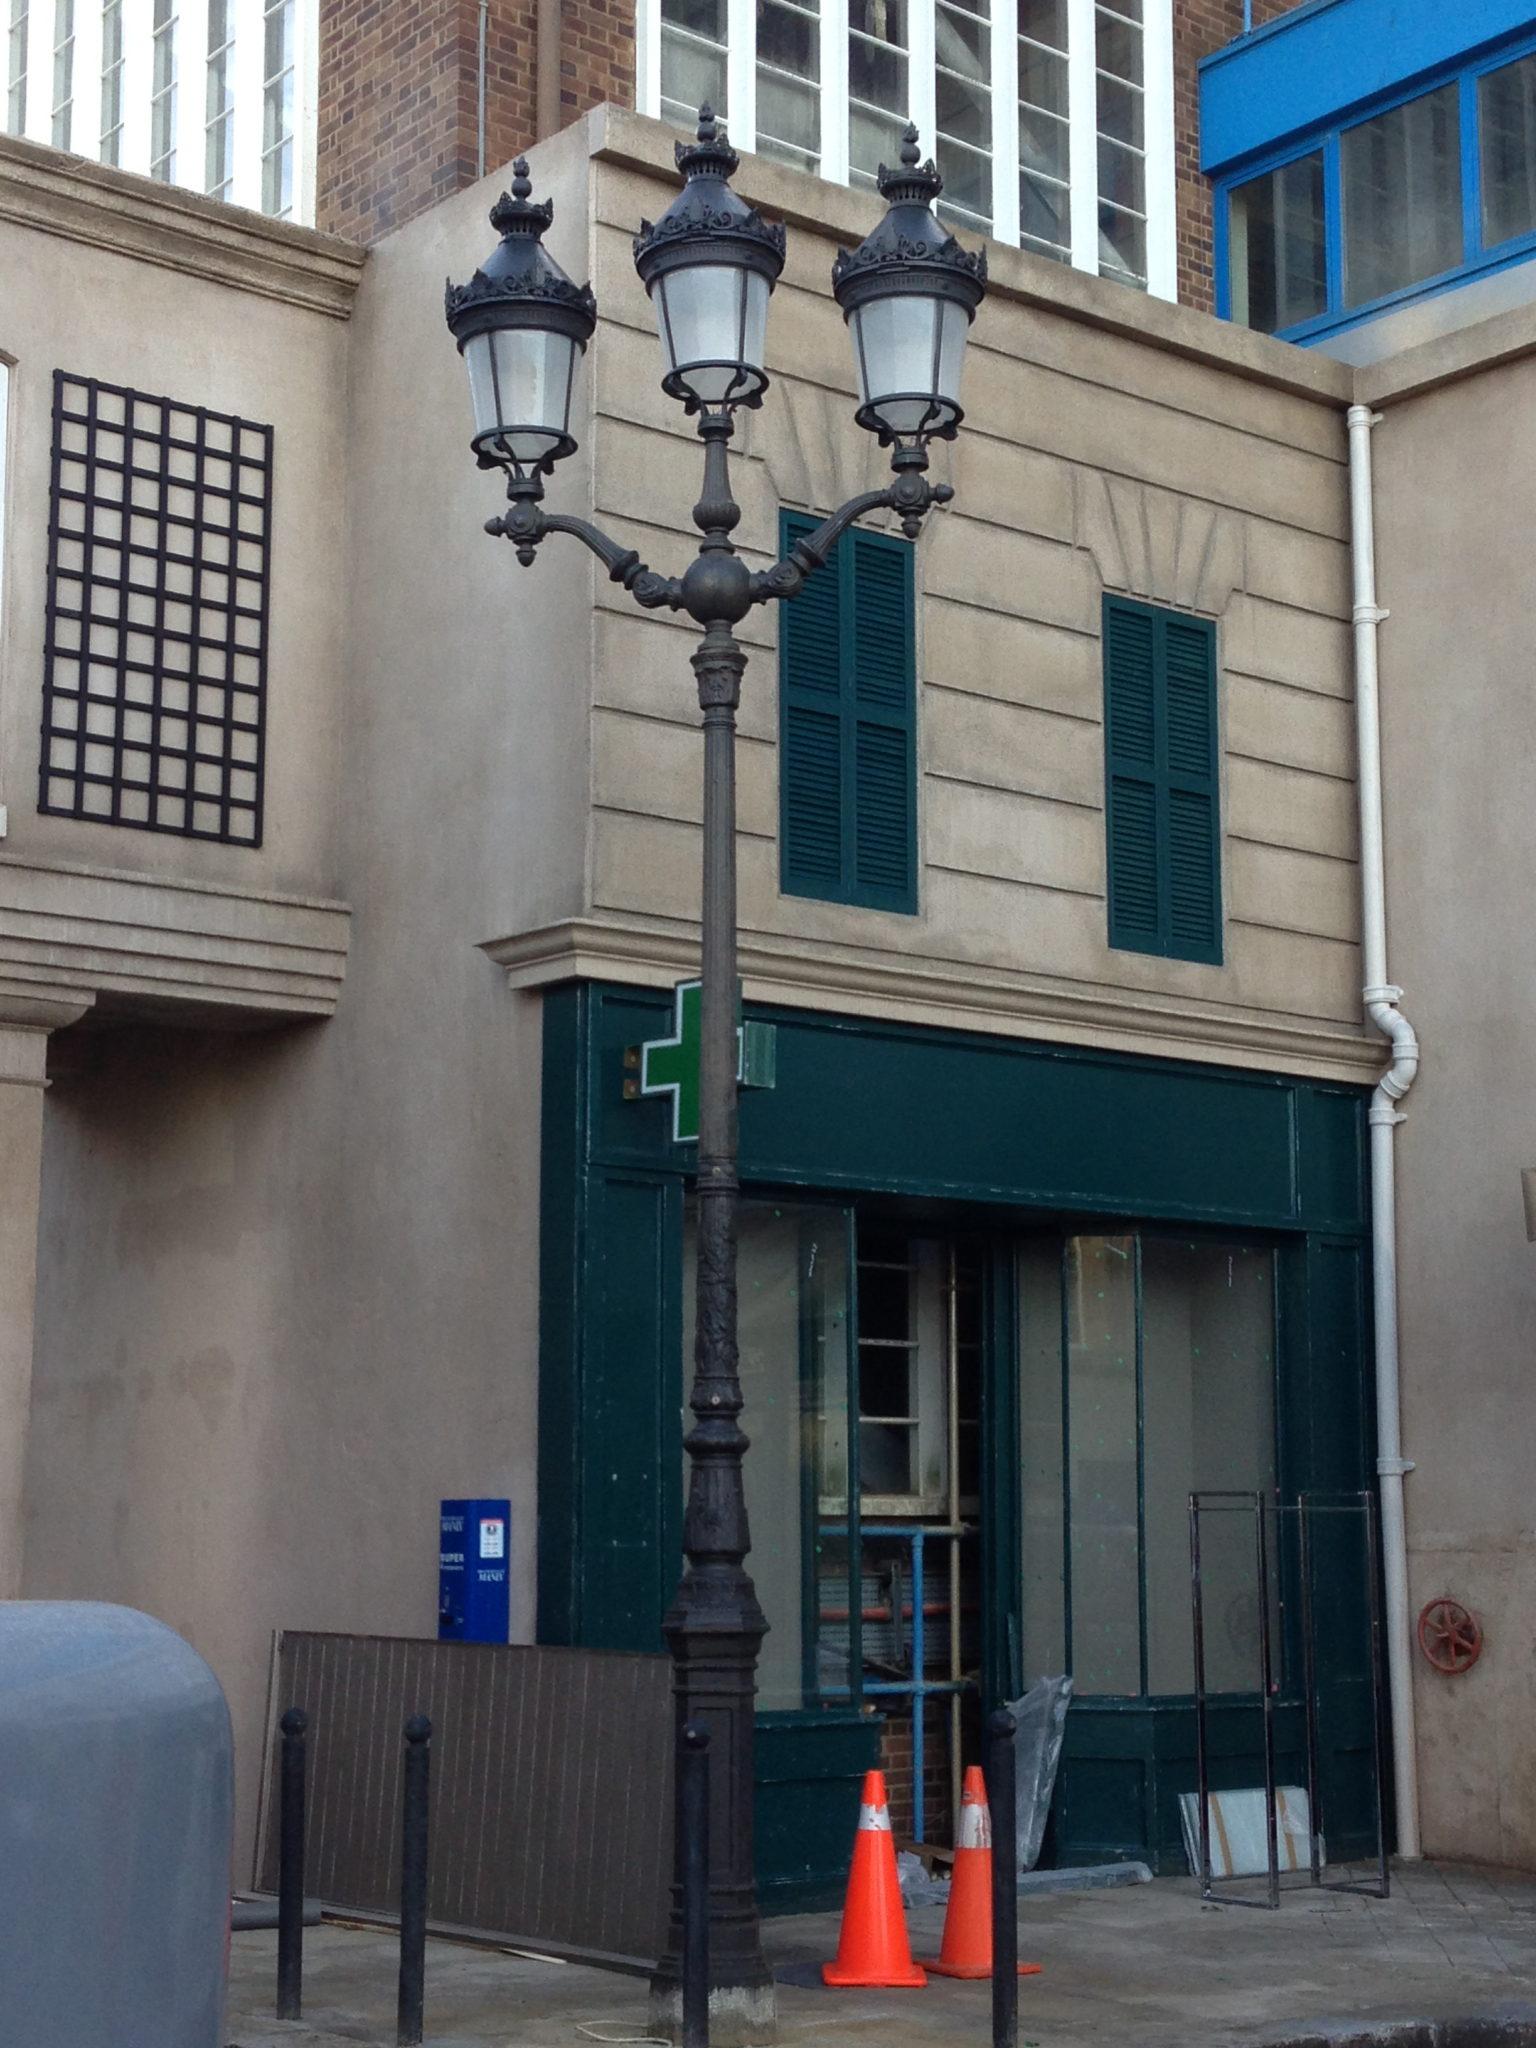 French Street Light - French Street Light Triple Head